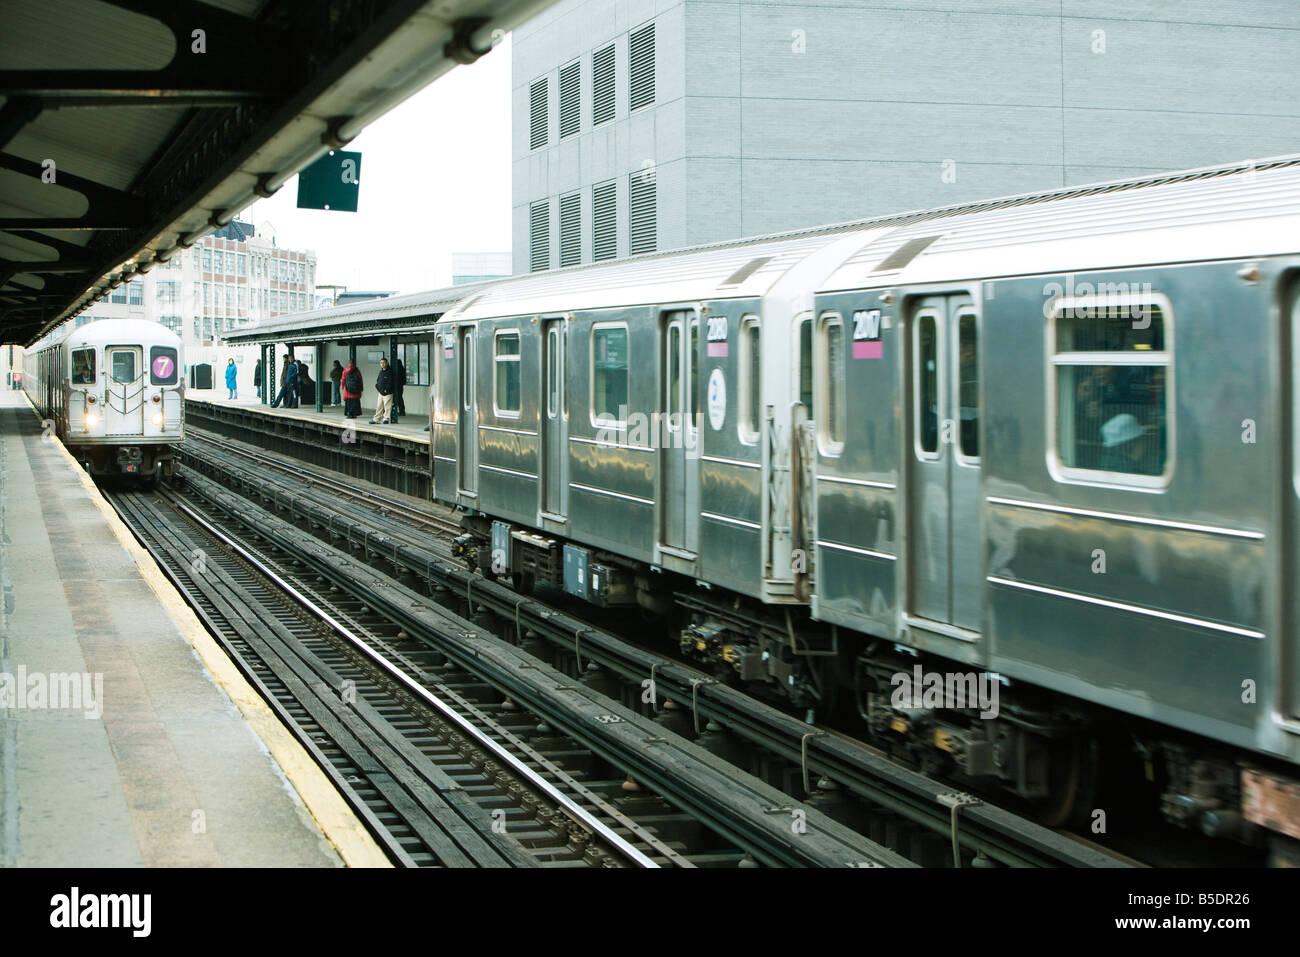 Commuters waiting for subway on elevated train platform, IRT Flushing Line of New York City Subway - Stock Image